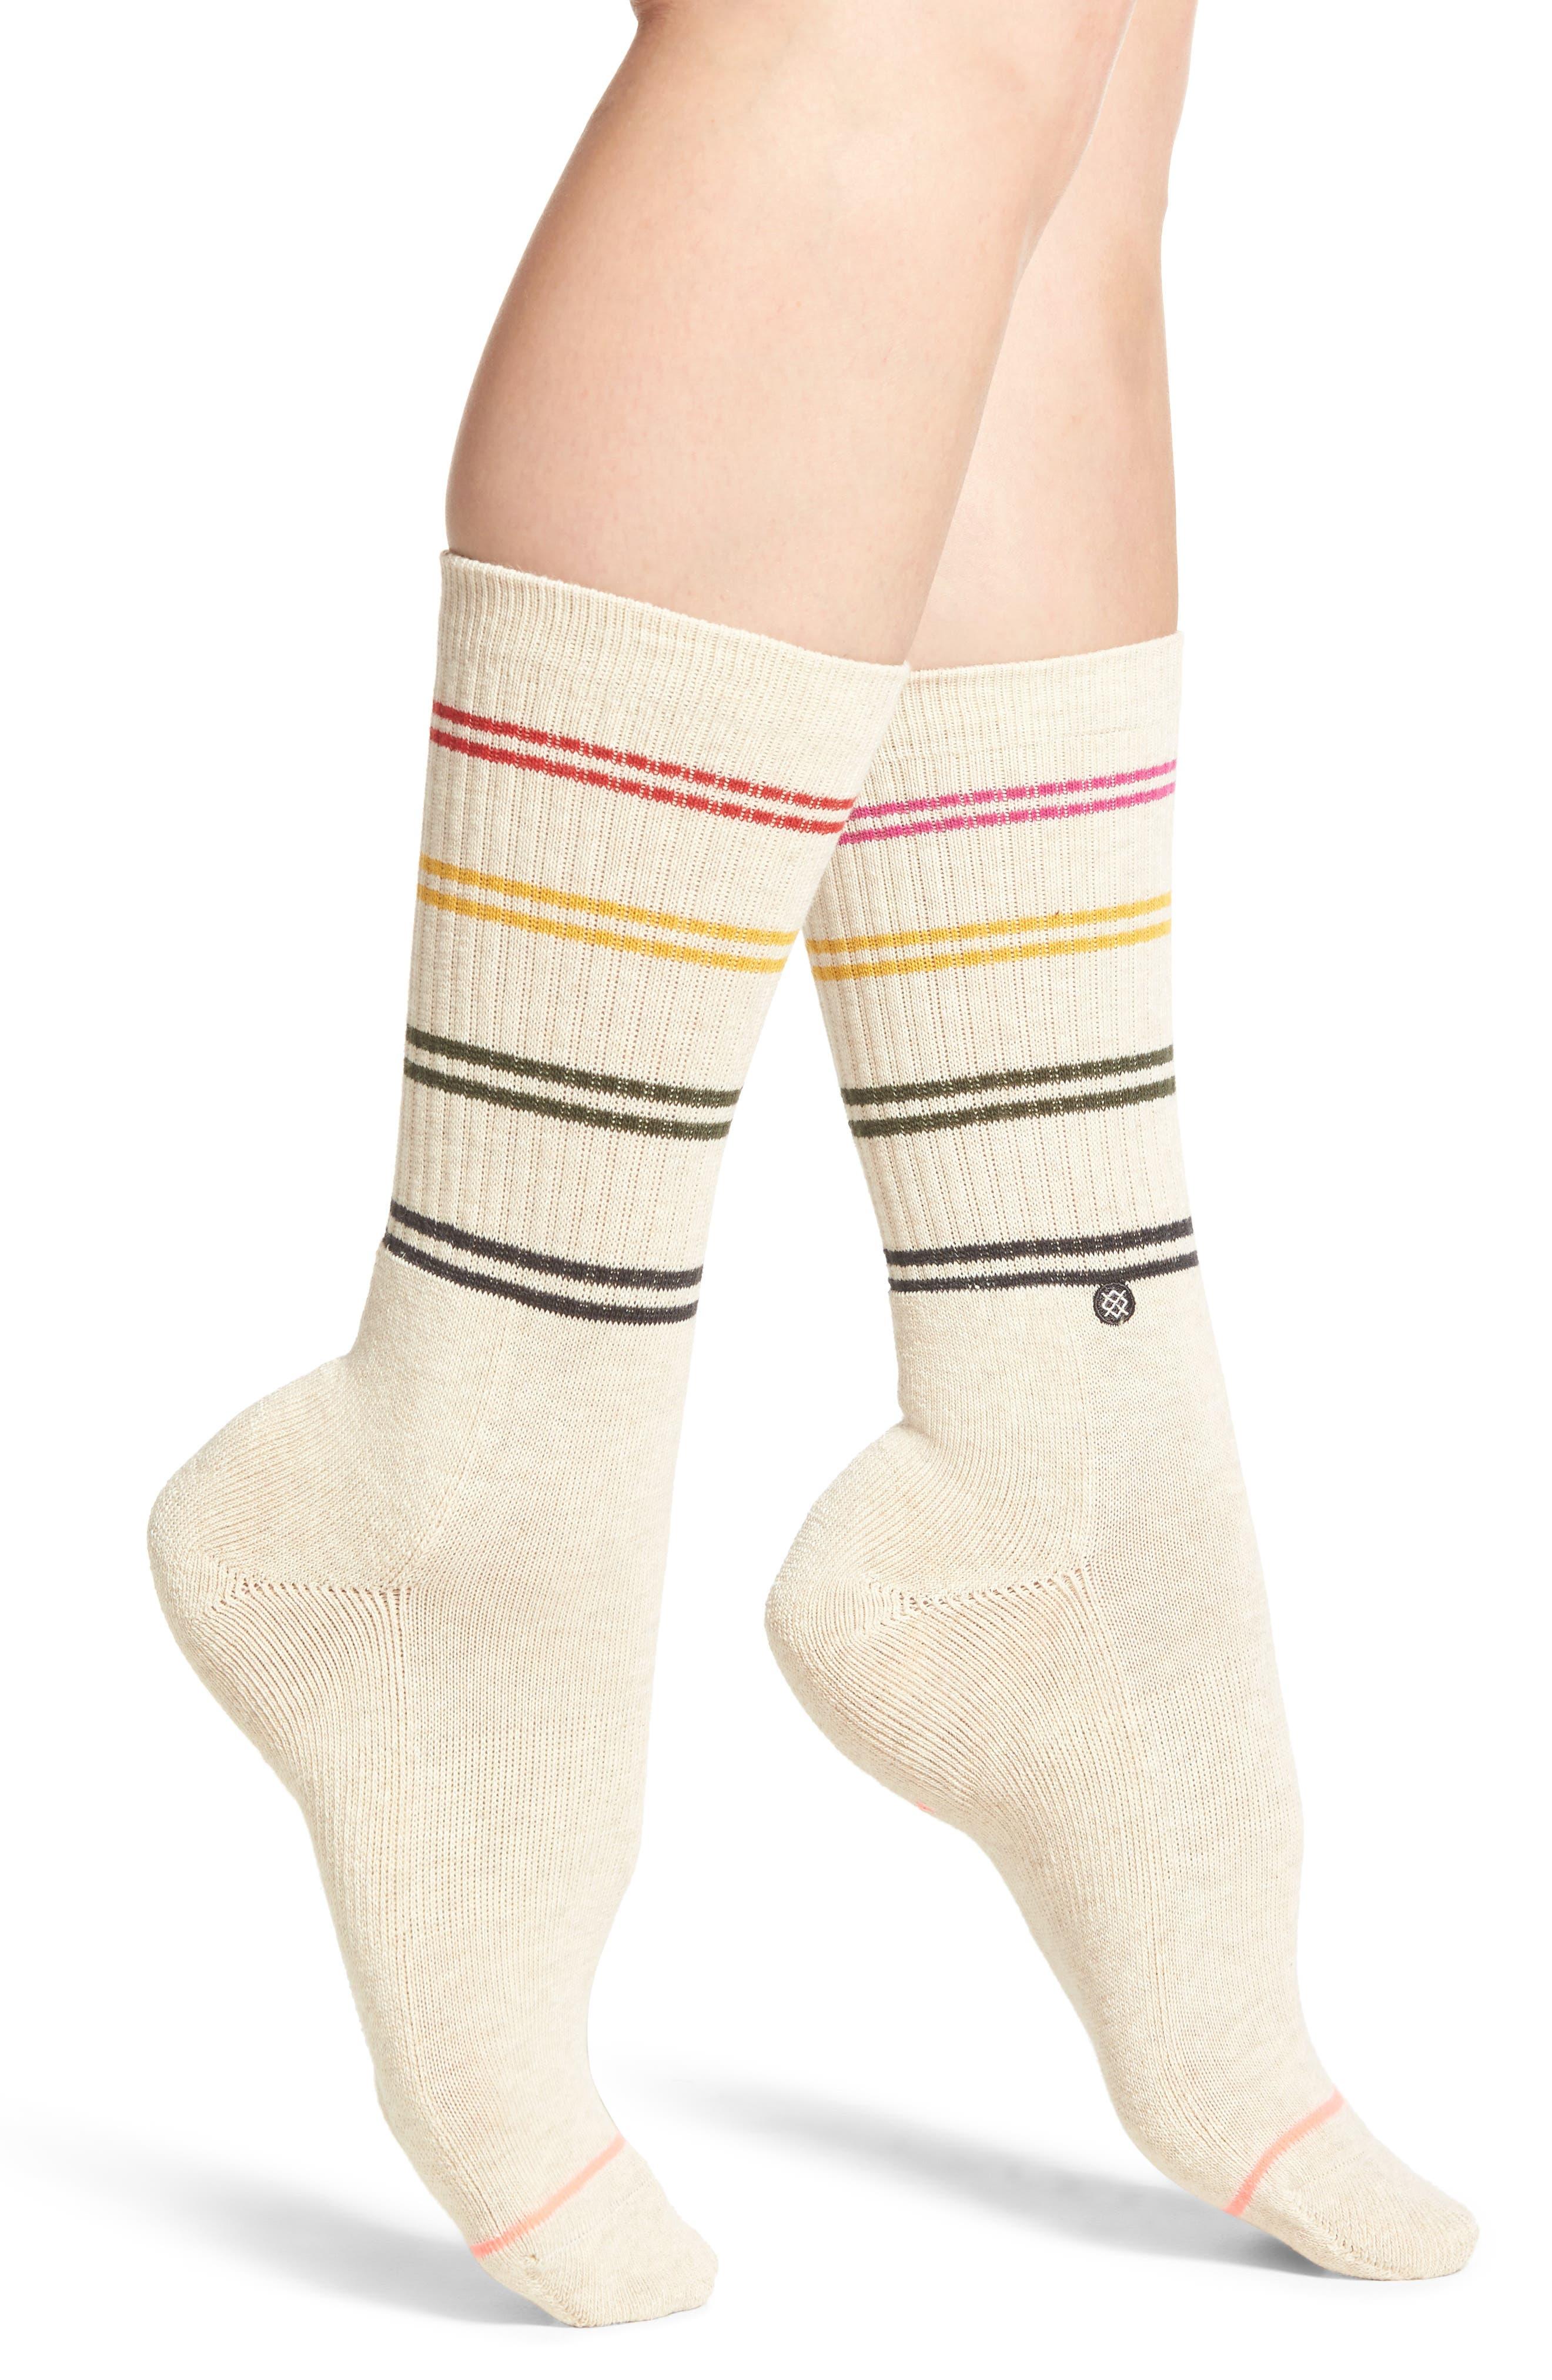 Jah Crew Socks,                         Main,                         color, Oatmeal Heather